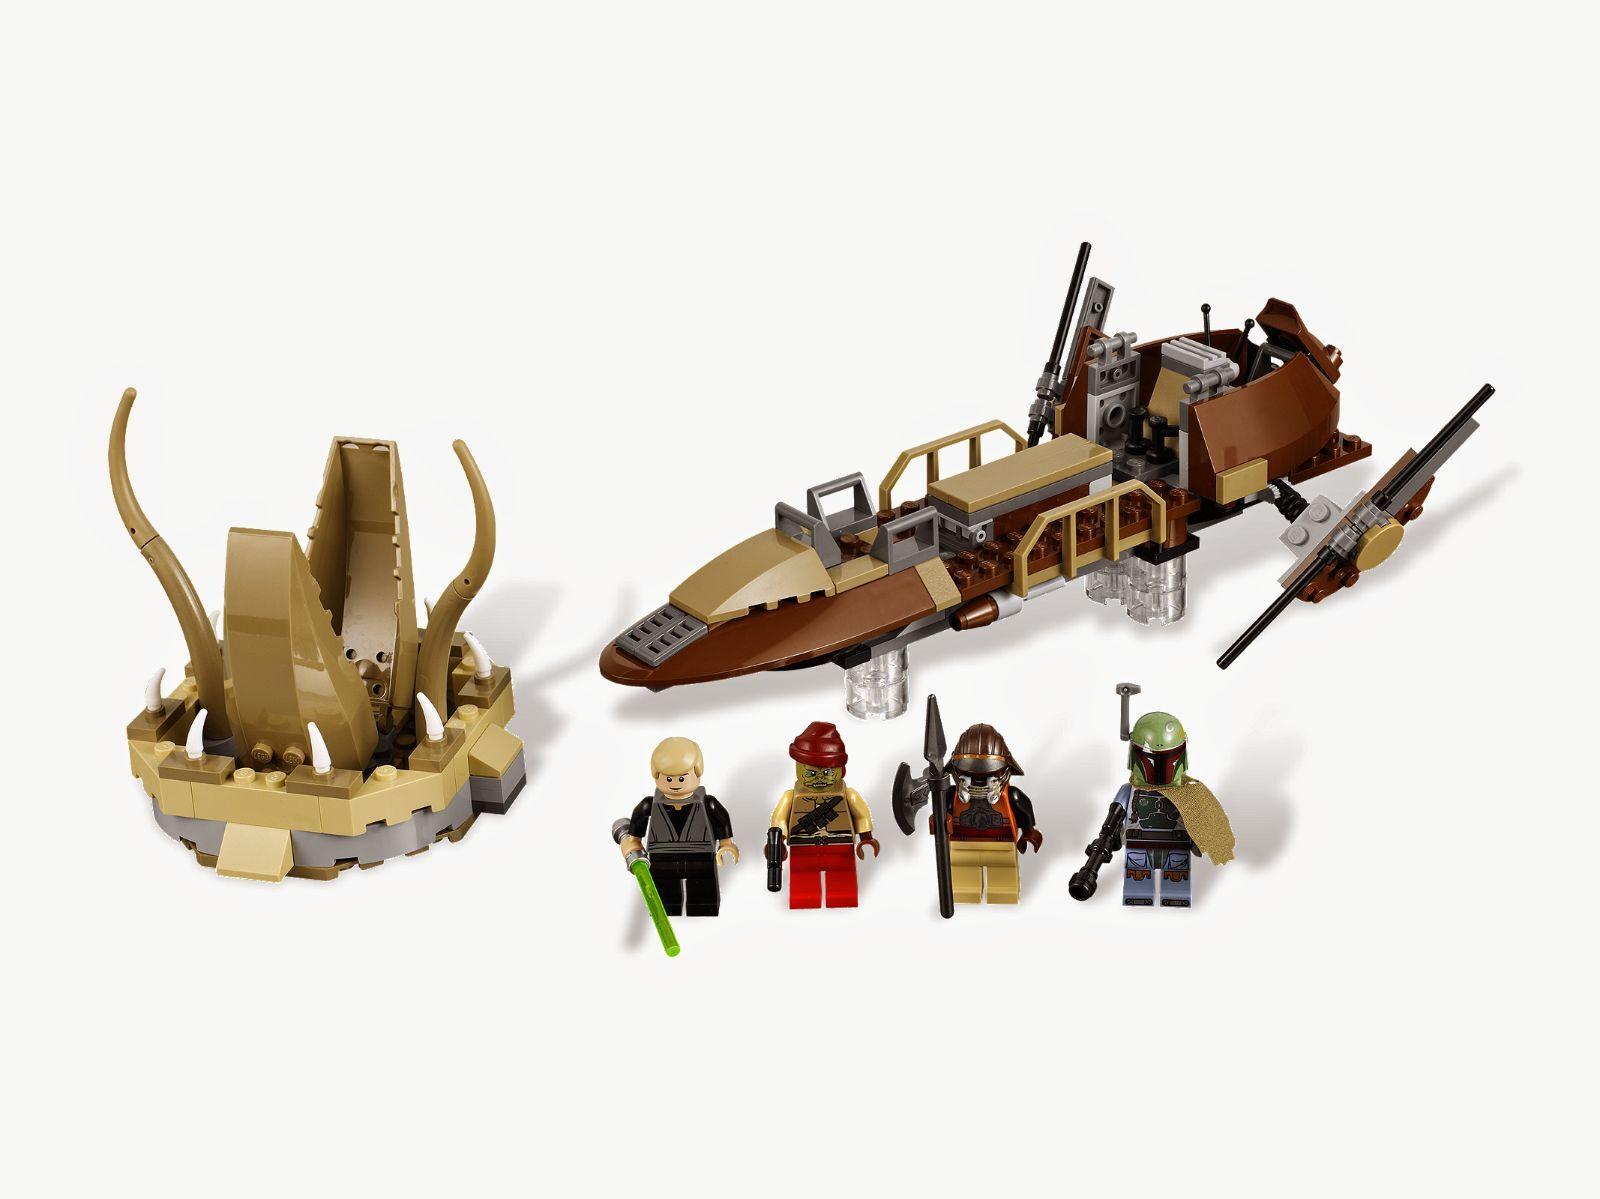 Lego 9496 Star Wars Desert Skiff complet Notice boite de 2012